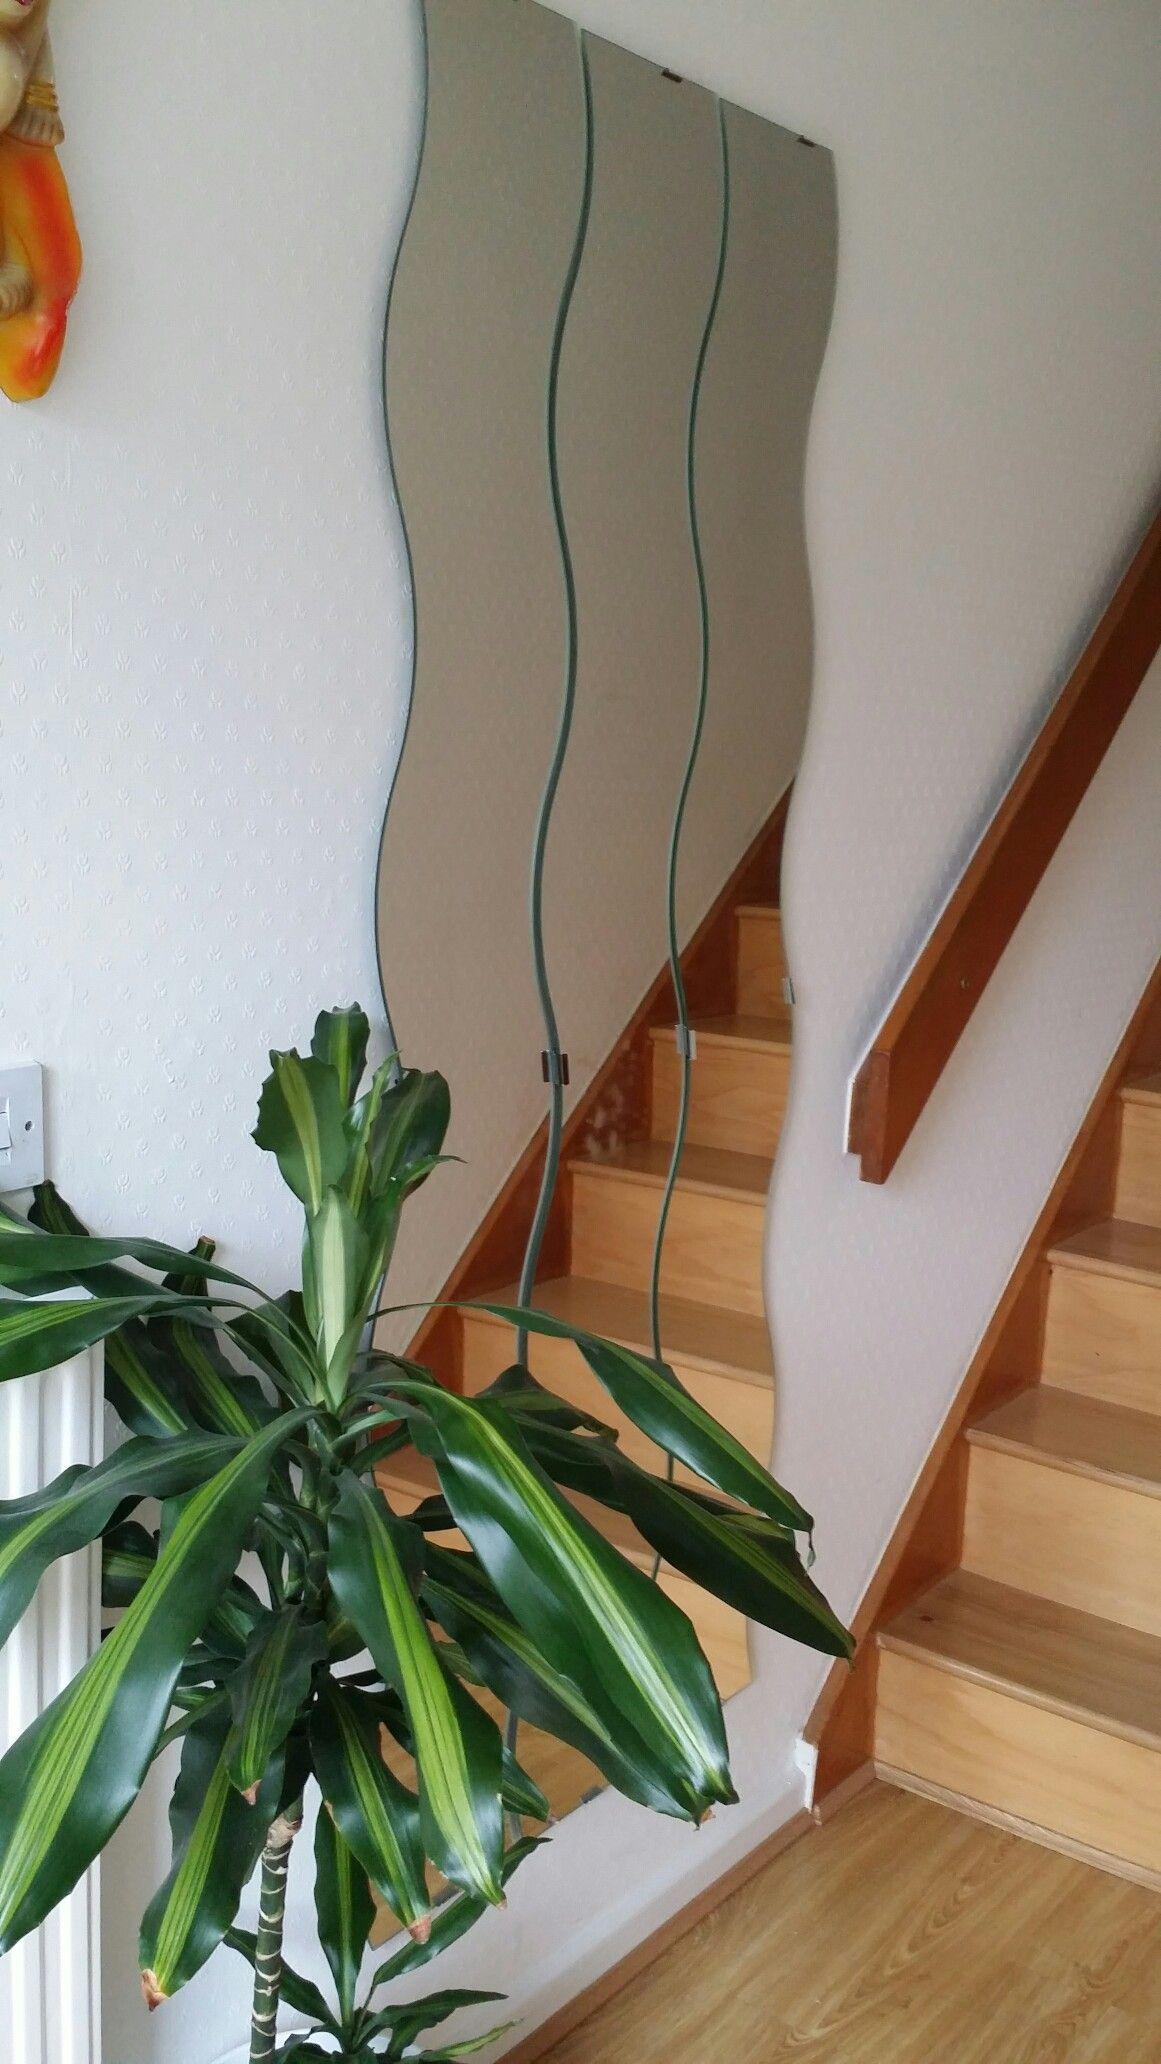 Ikea Wavy Mirrors Mirror Decor Mirror Bedroom Decor Mirror Wall Decor